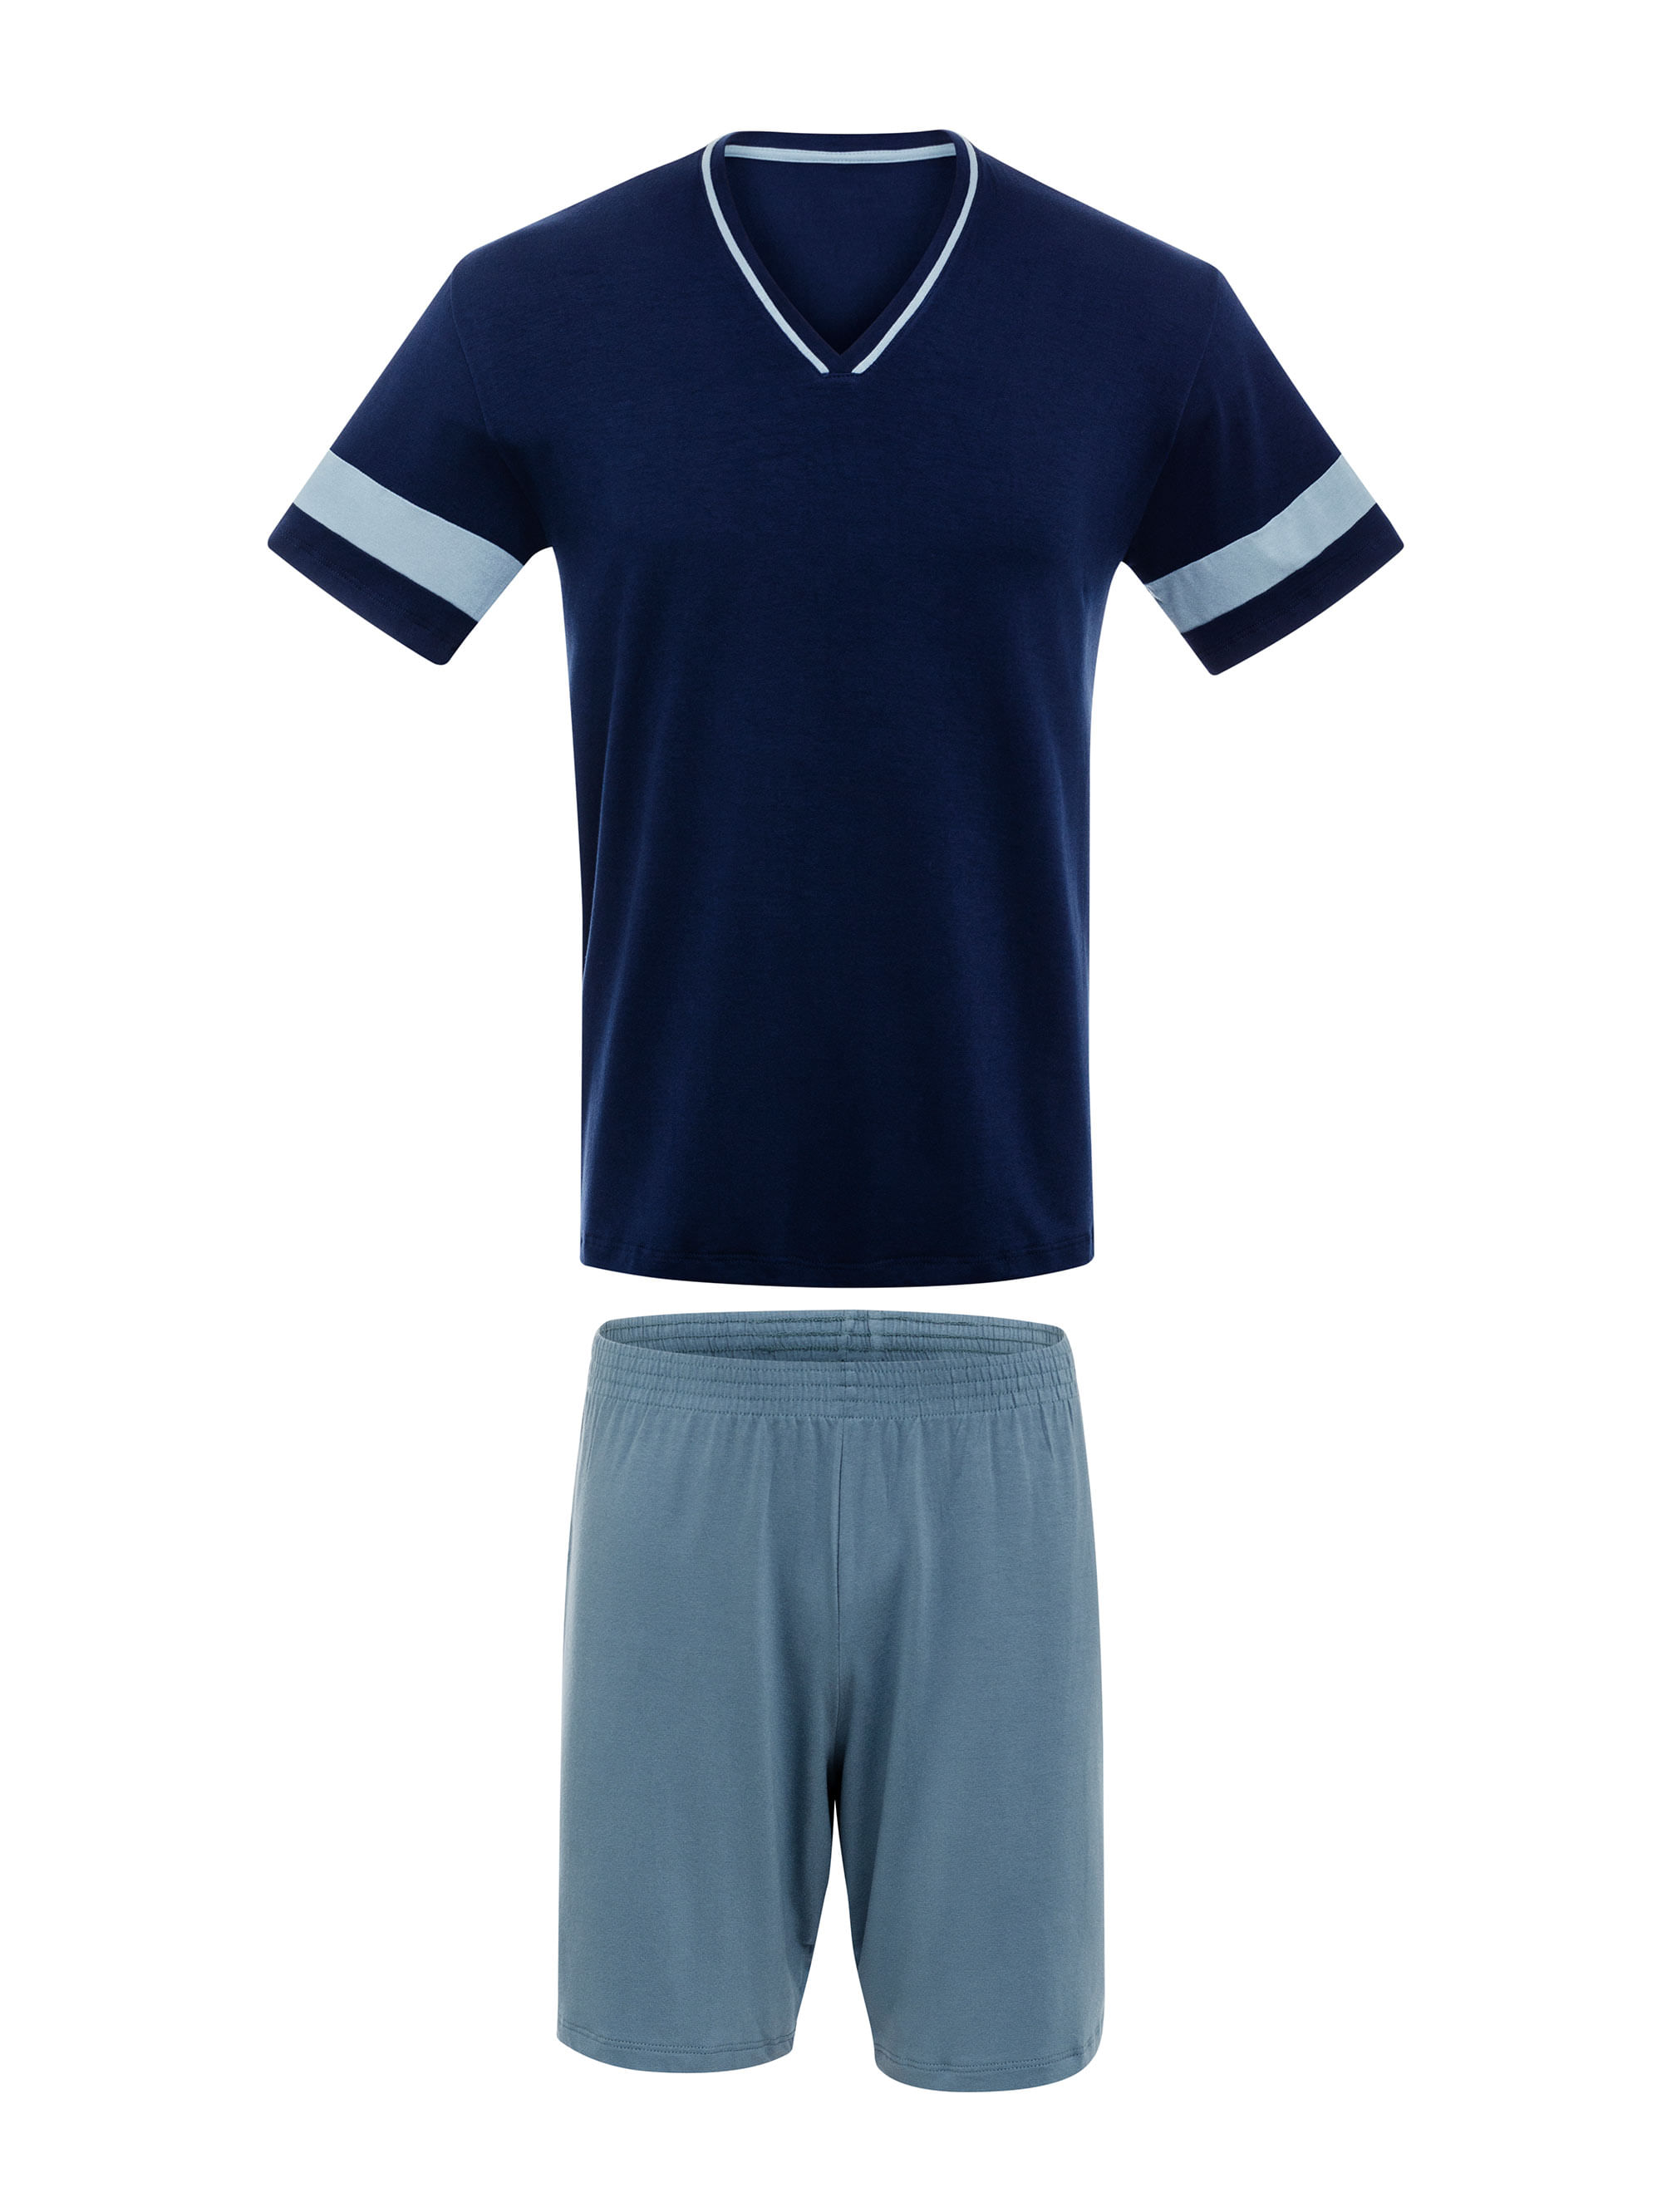 Pijama-Curto---Manga-Curta---M---Corveti---OUT--04.02.0774